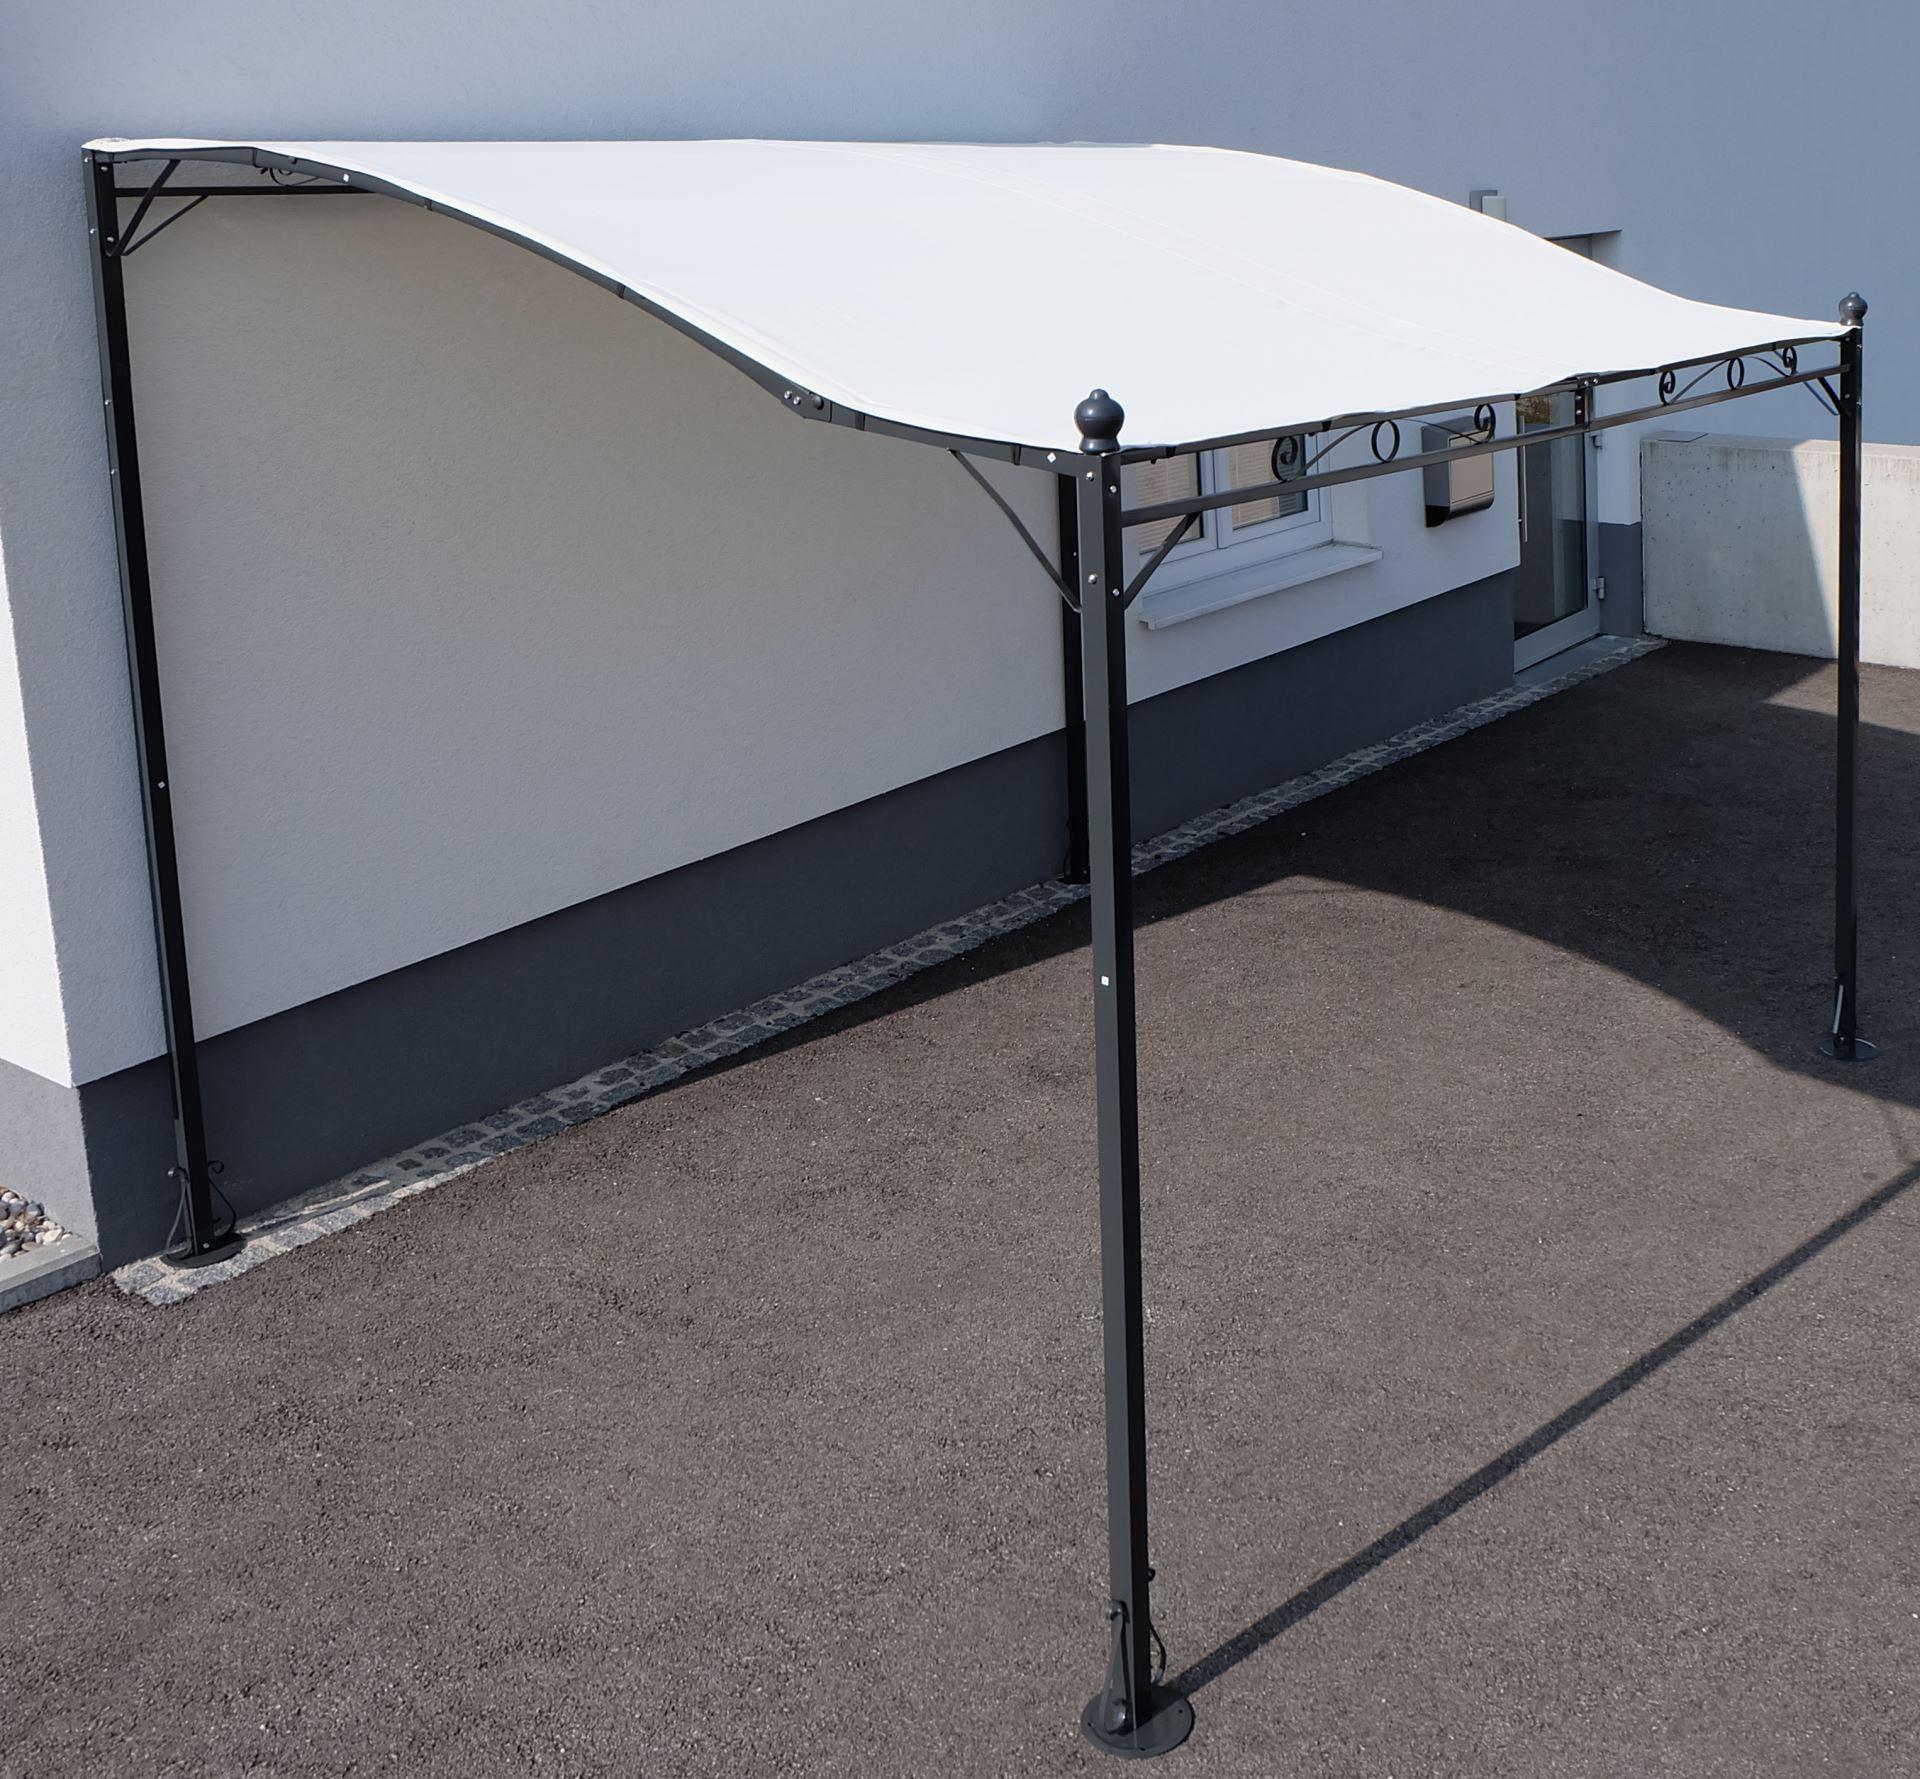 wand anbau pavillon 3 x 2 5 meter mit dach 100 wasserdicht uv30 model topea kaufen bei as. Black Bedroom Furniture Sets. Home Design Ideas